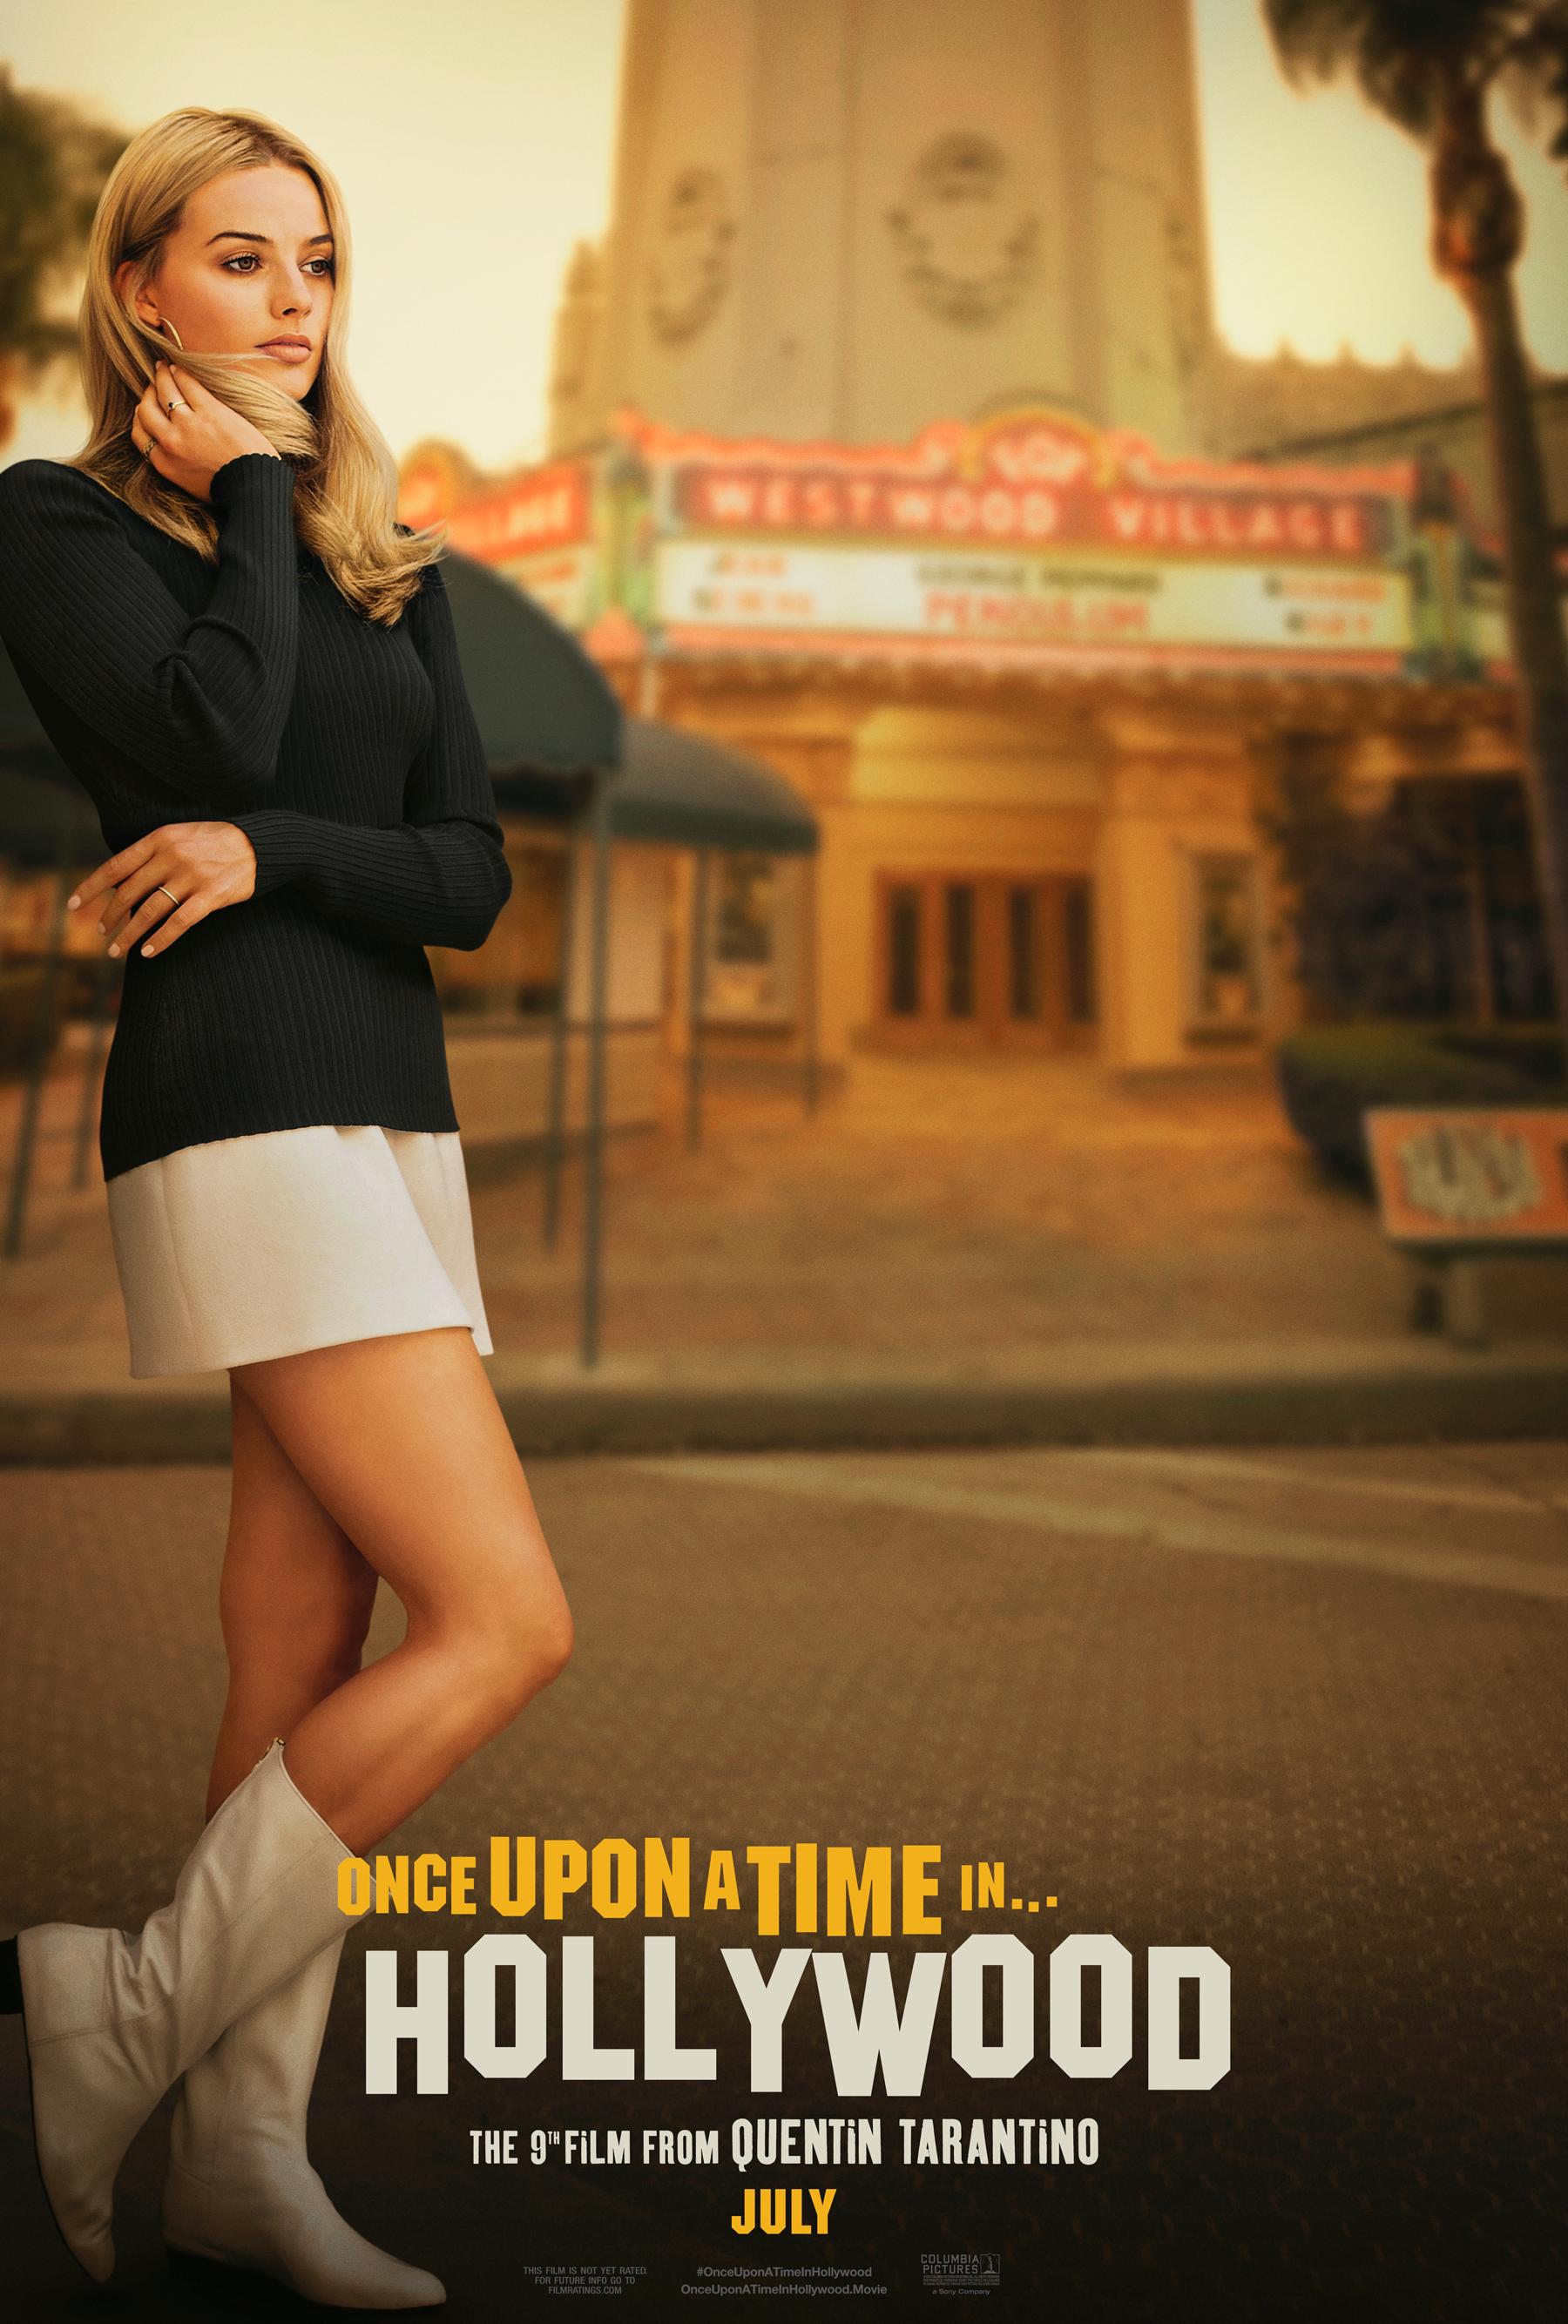 9 movie 2019 rating Hollywood 1969 OnceUponATimeInHollywood In 2019